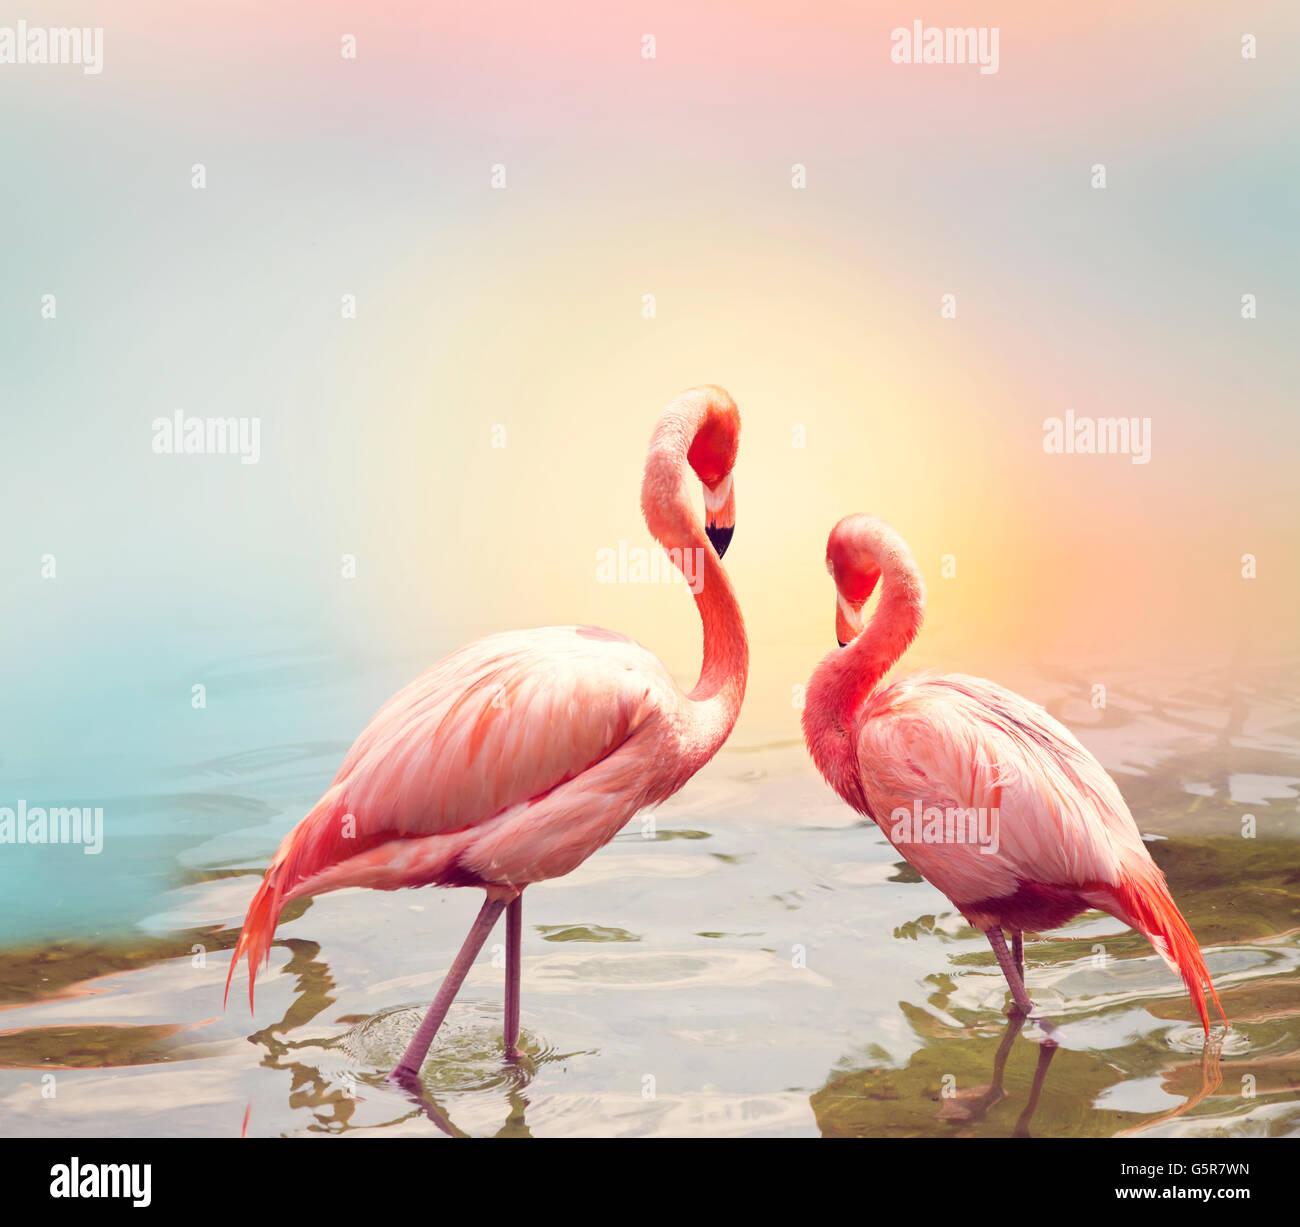 Two Pink Flamingos near water - Stock Image